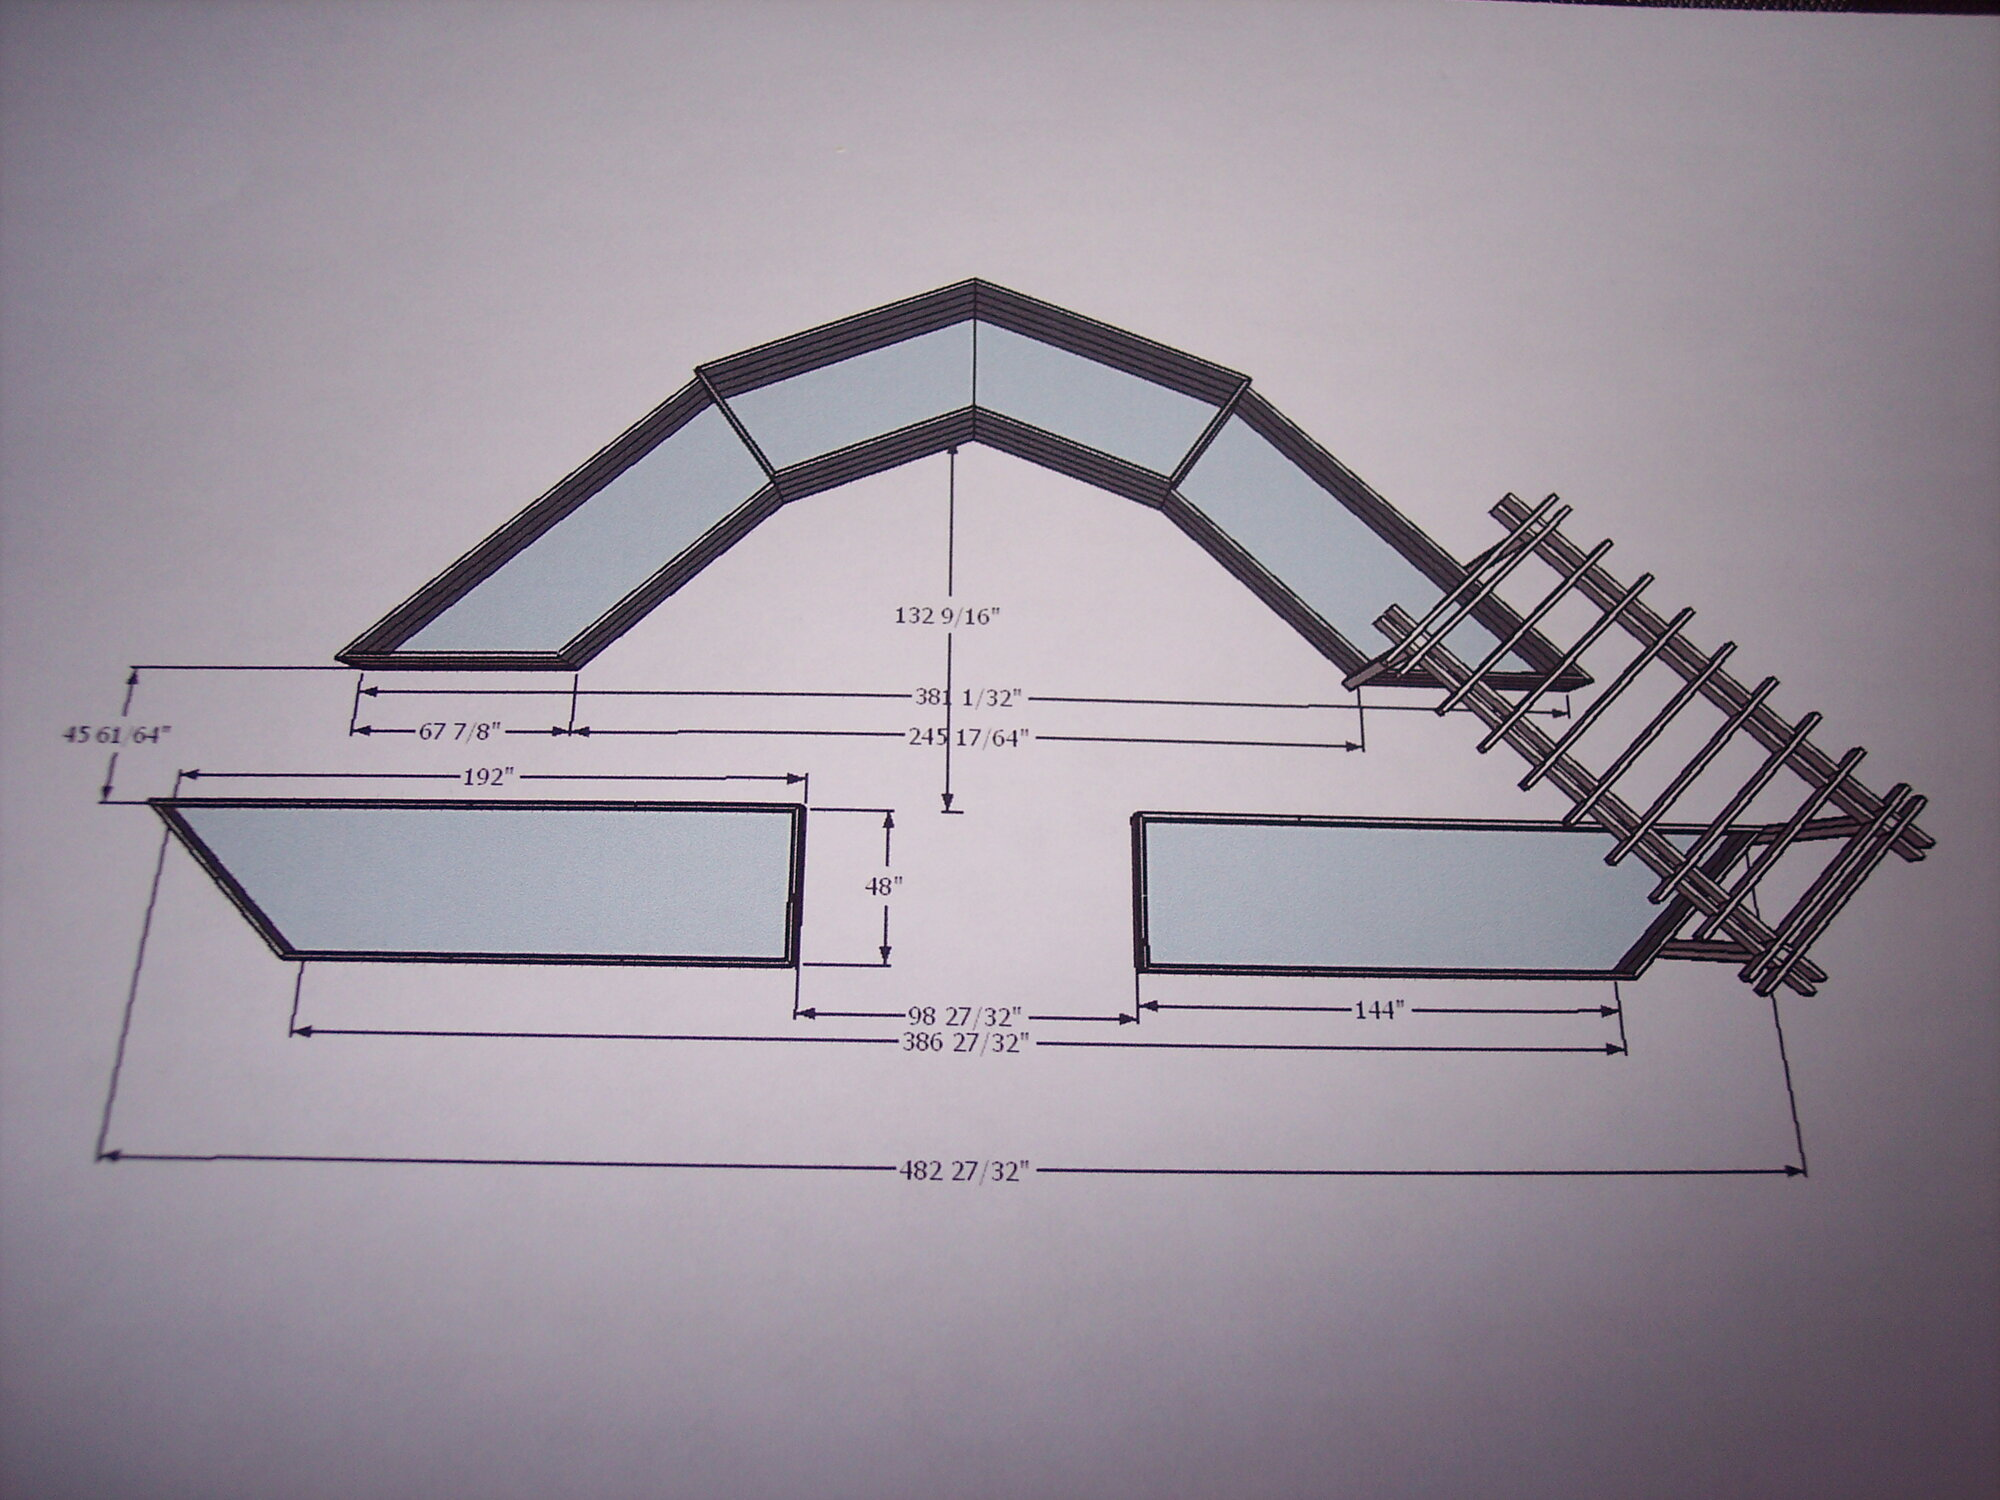 raised bed garden plan 002.JPG